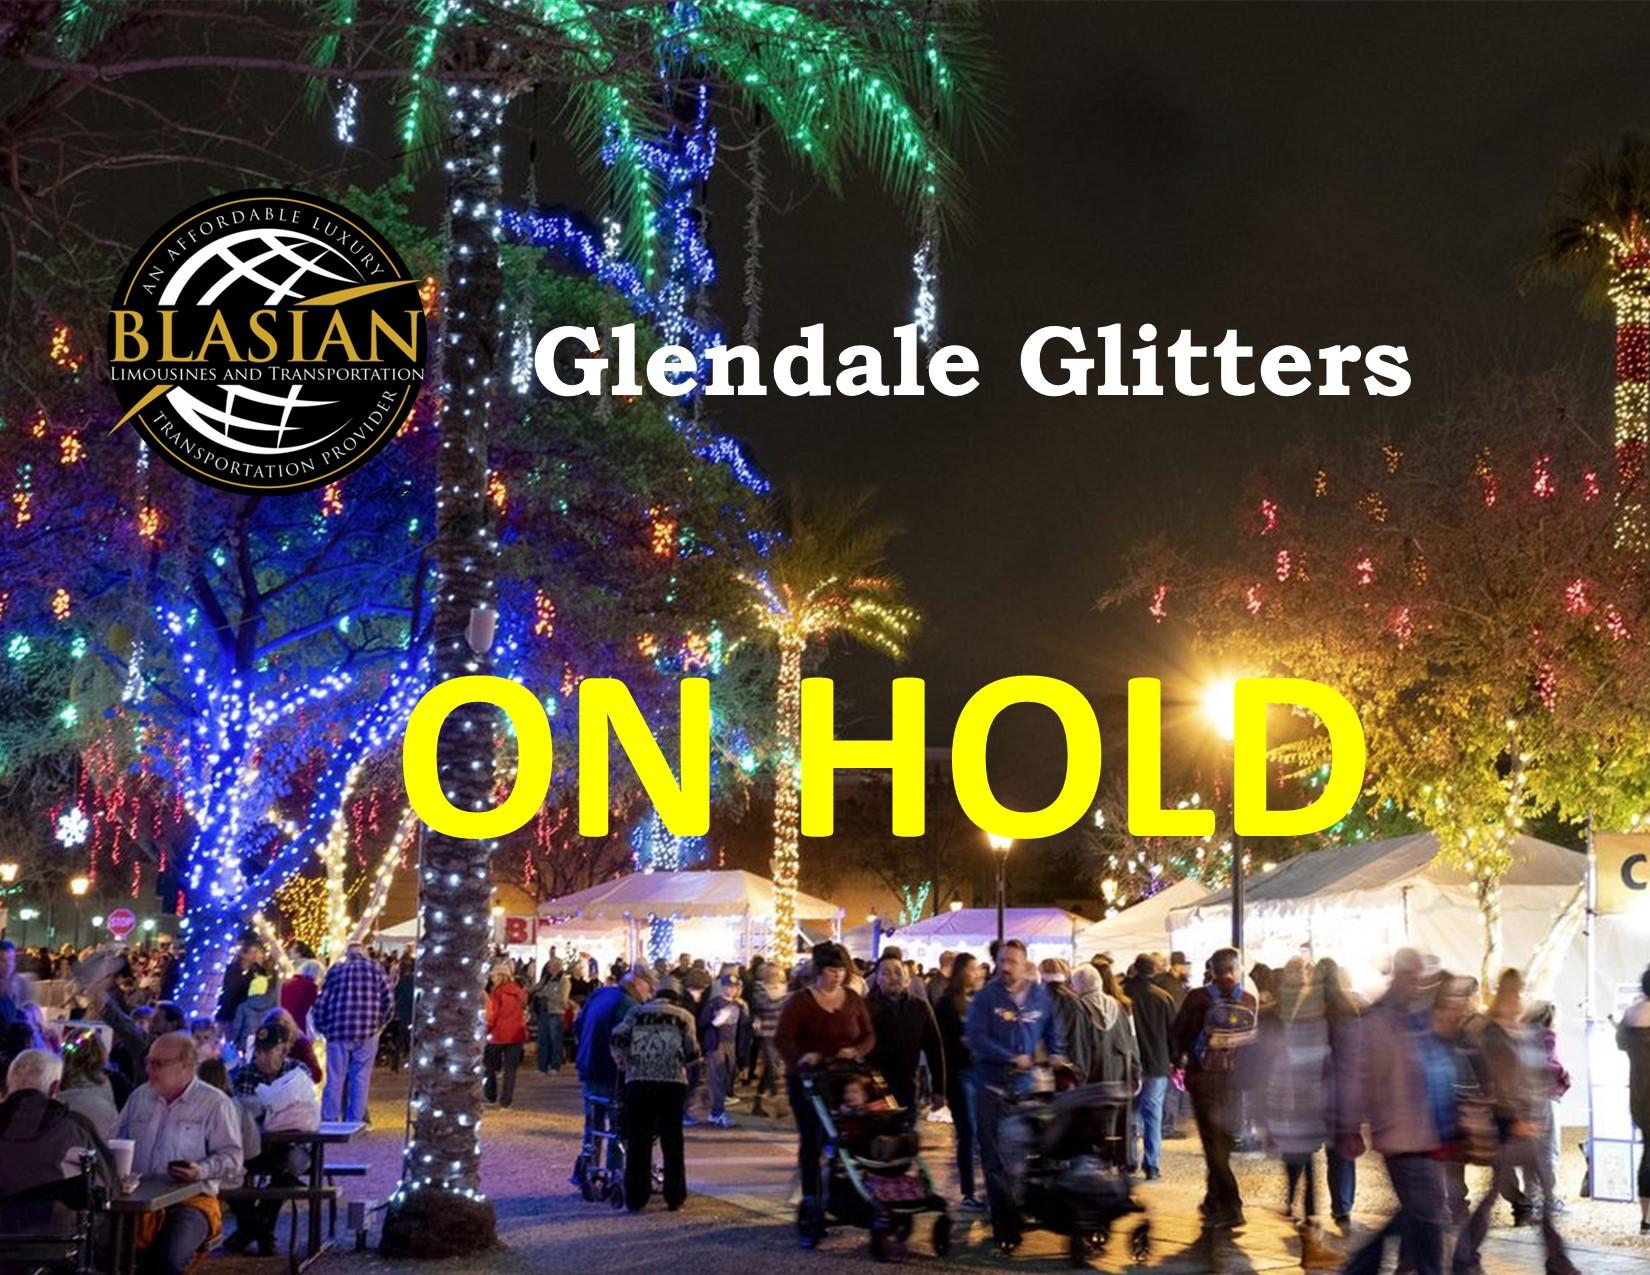 ON HOLD GLENDALE GLITTERS LIGHTS